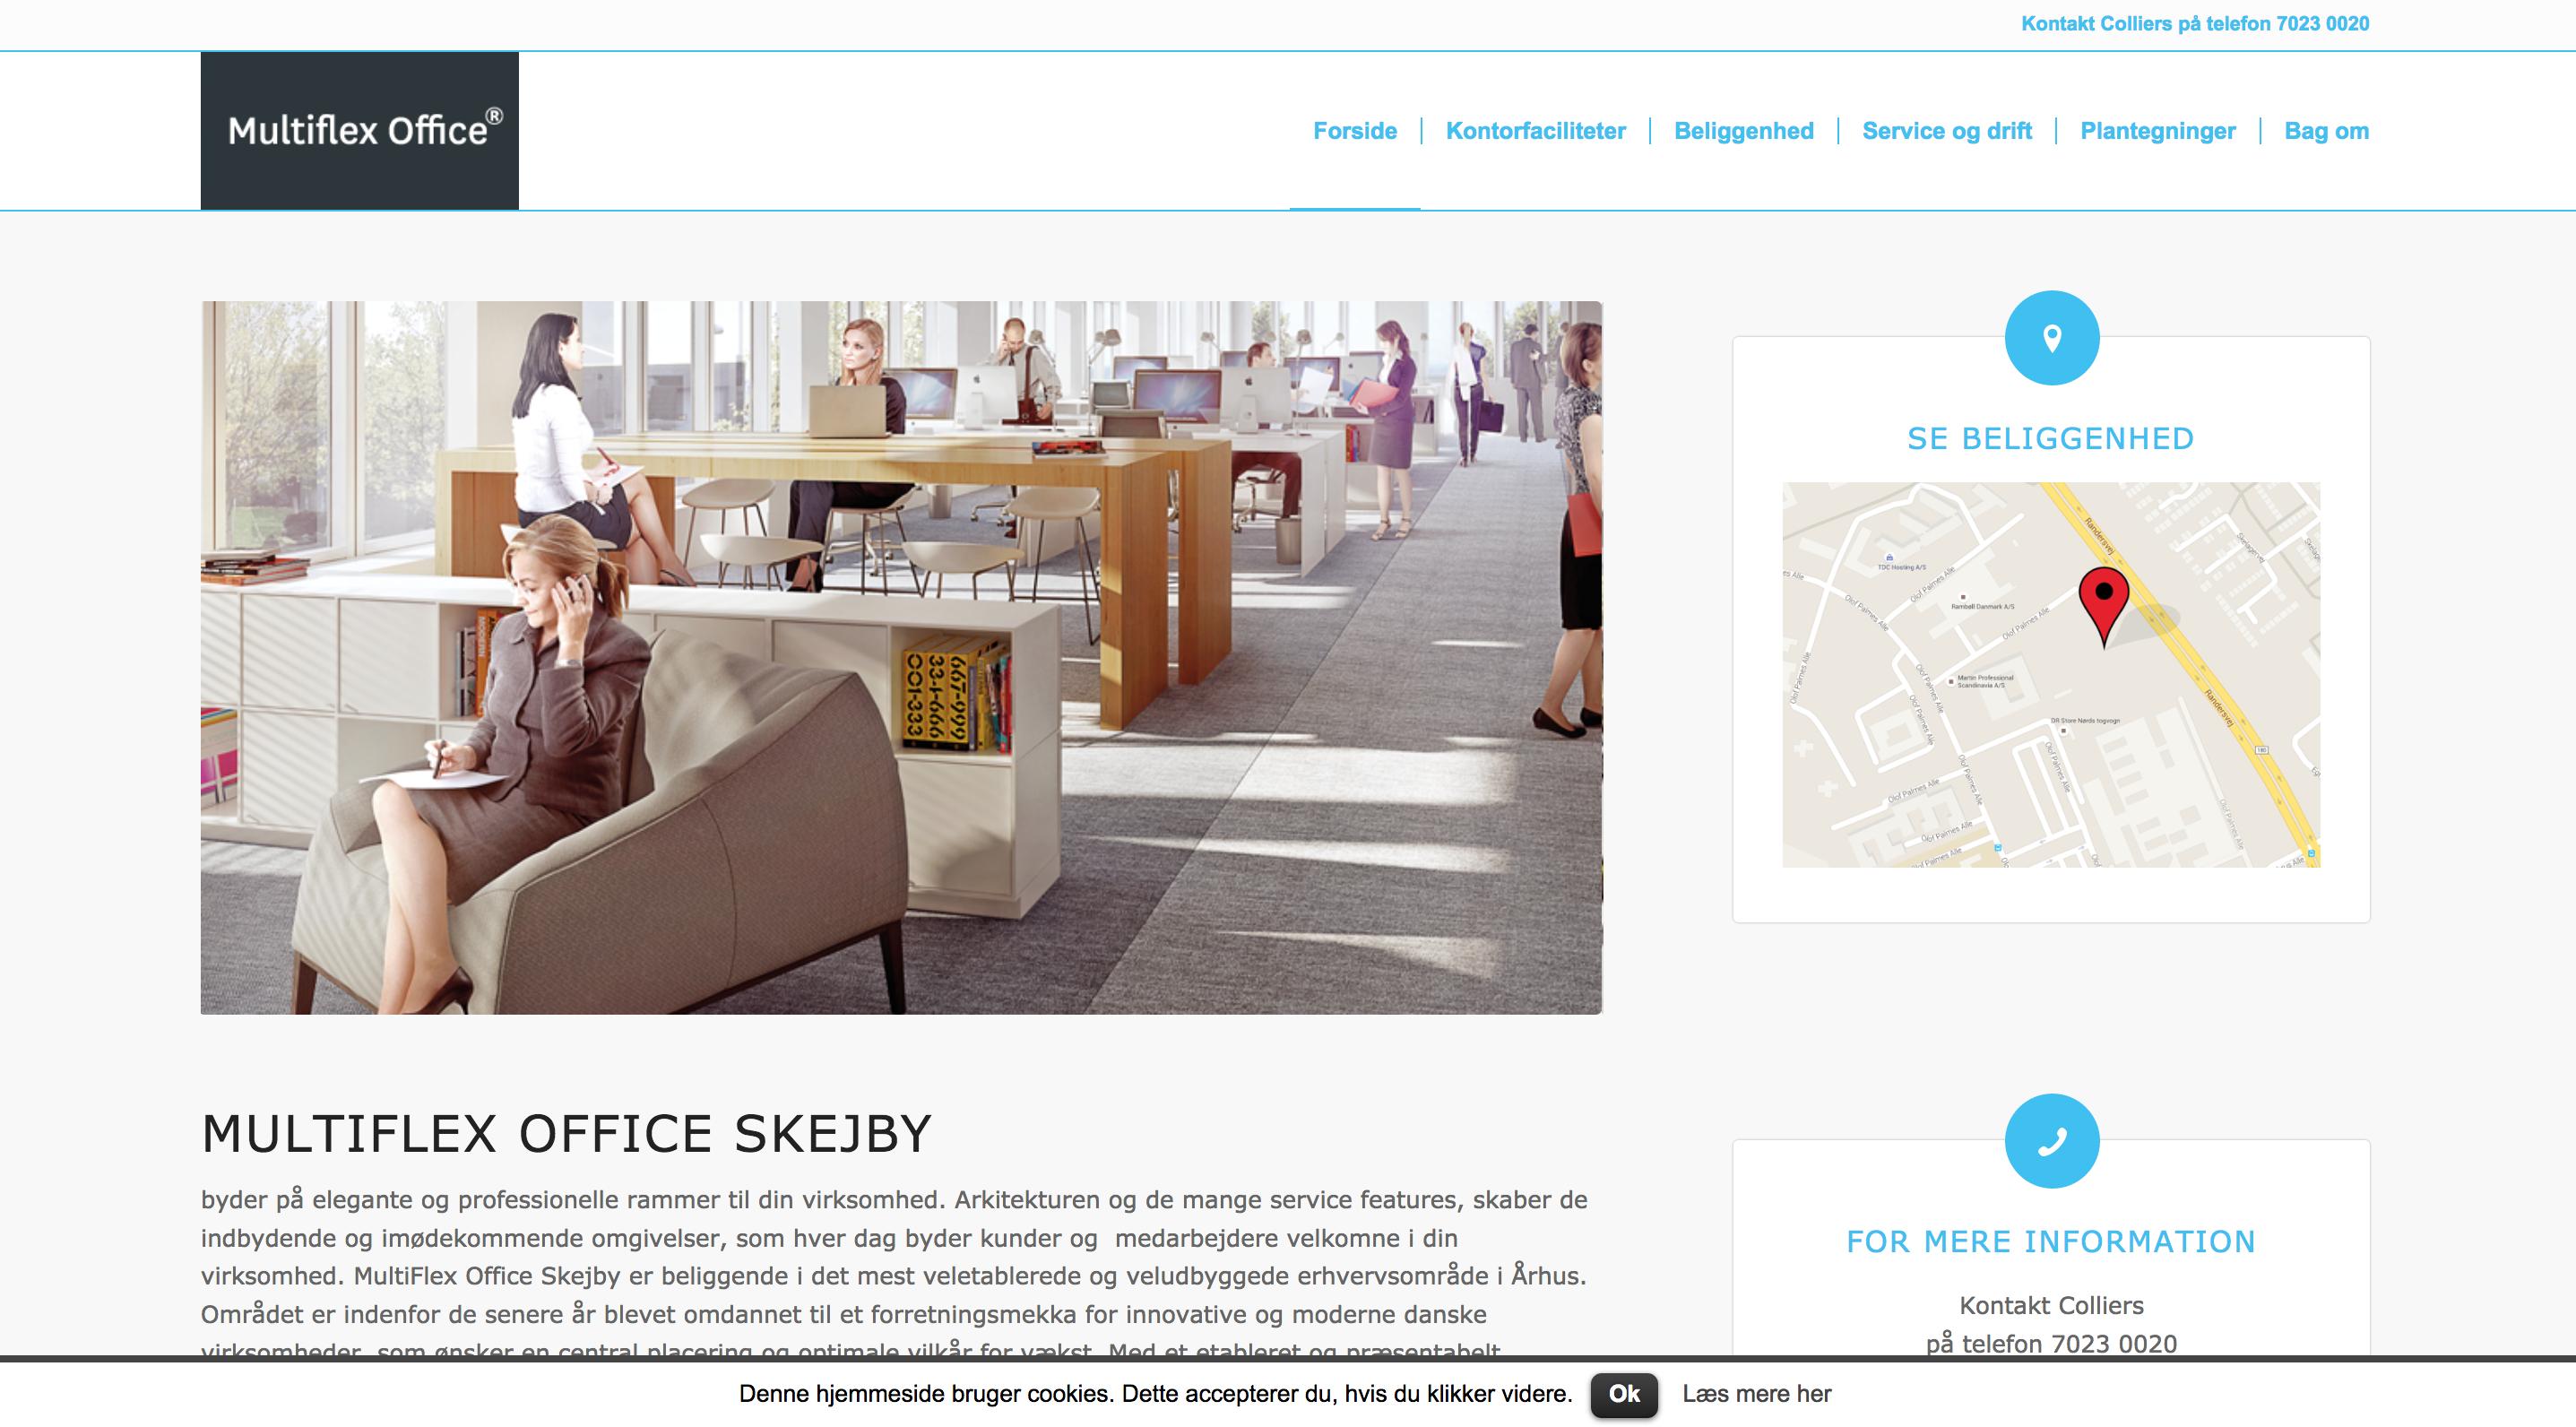 MTHøjgaard Multiflexofficeskejby - wordpress website til salg af kvadratmeter i nyt byggeri.